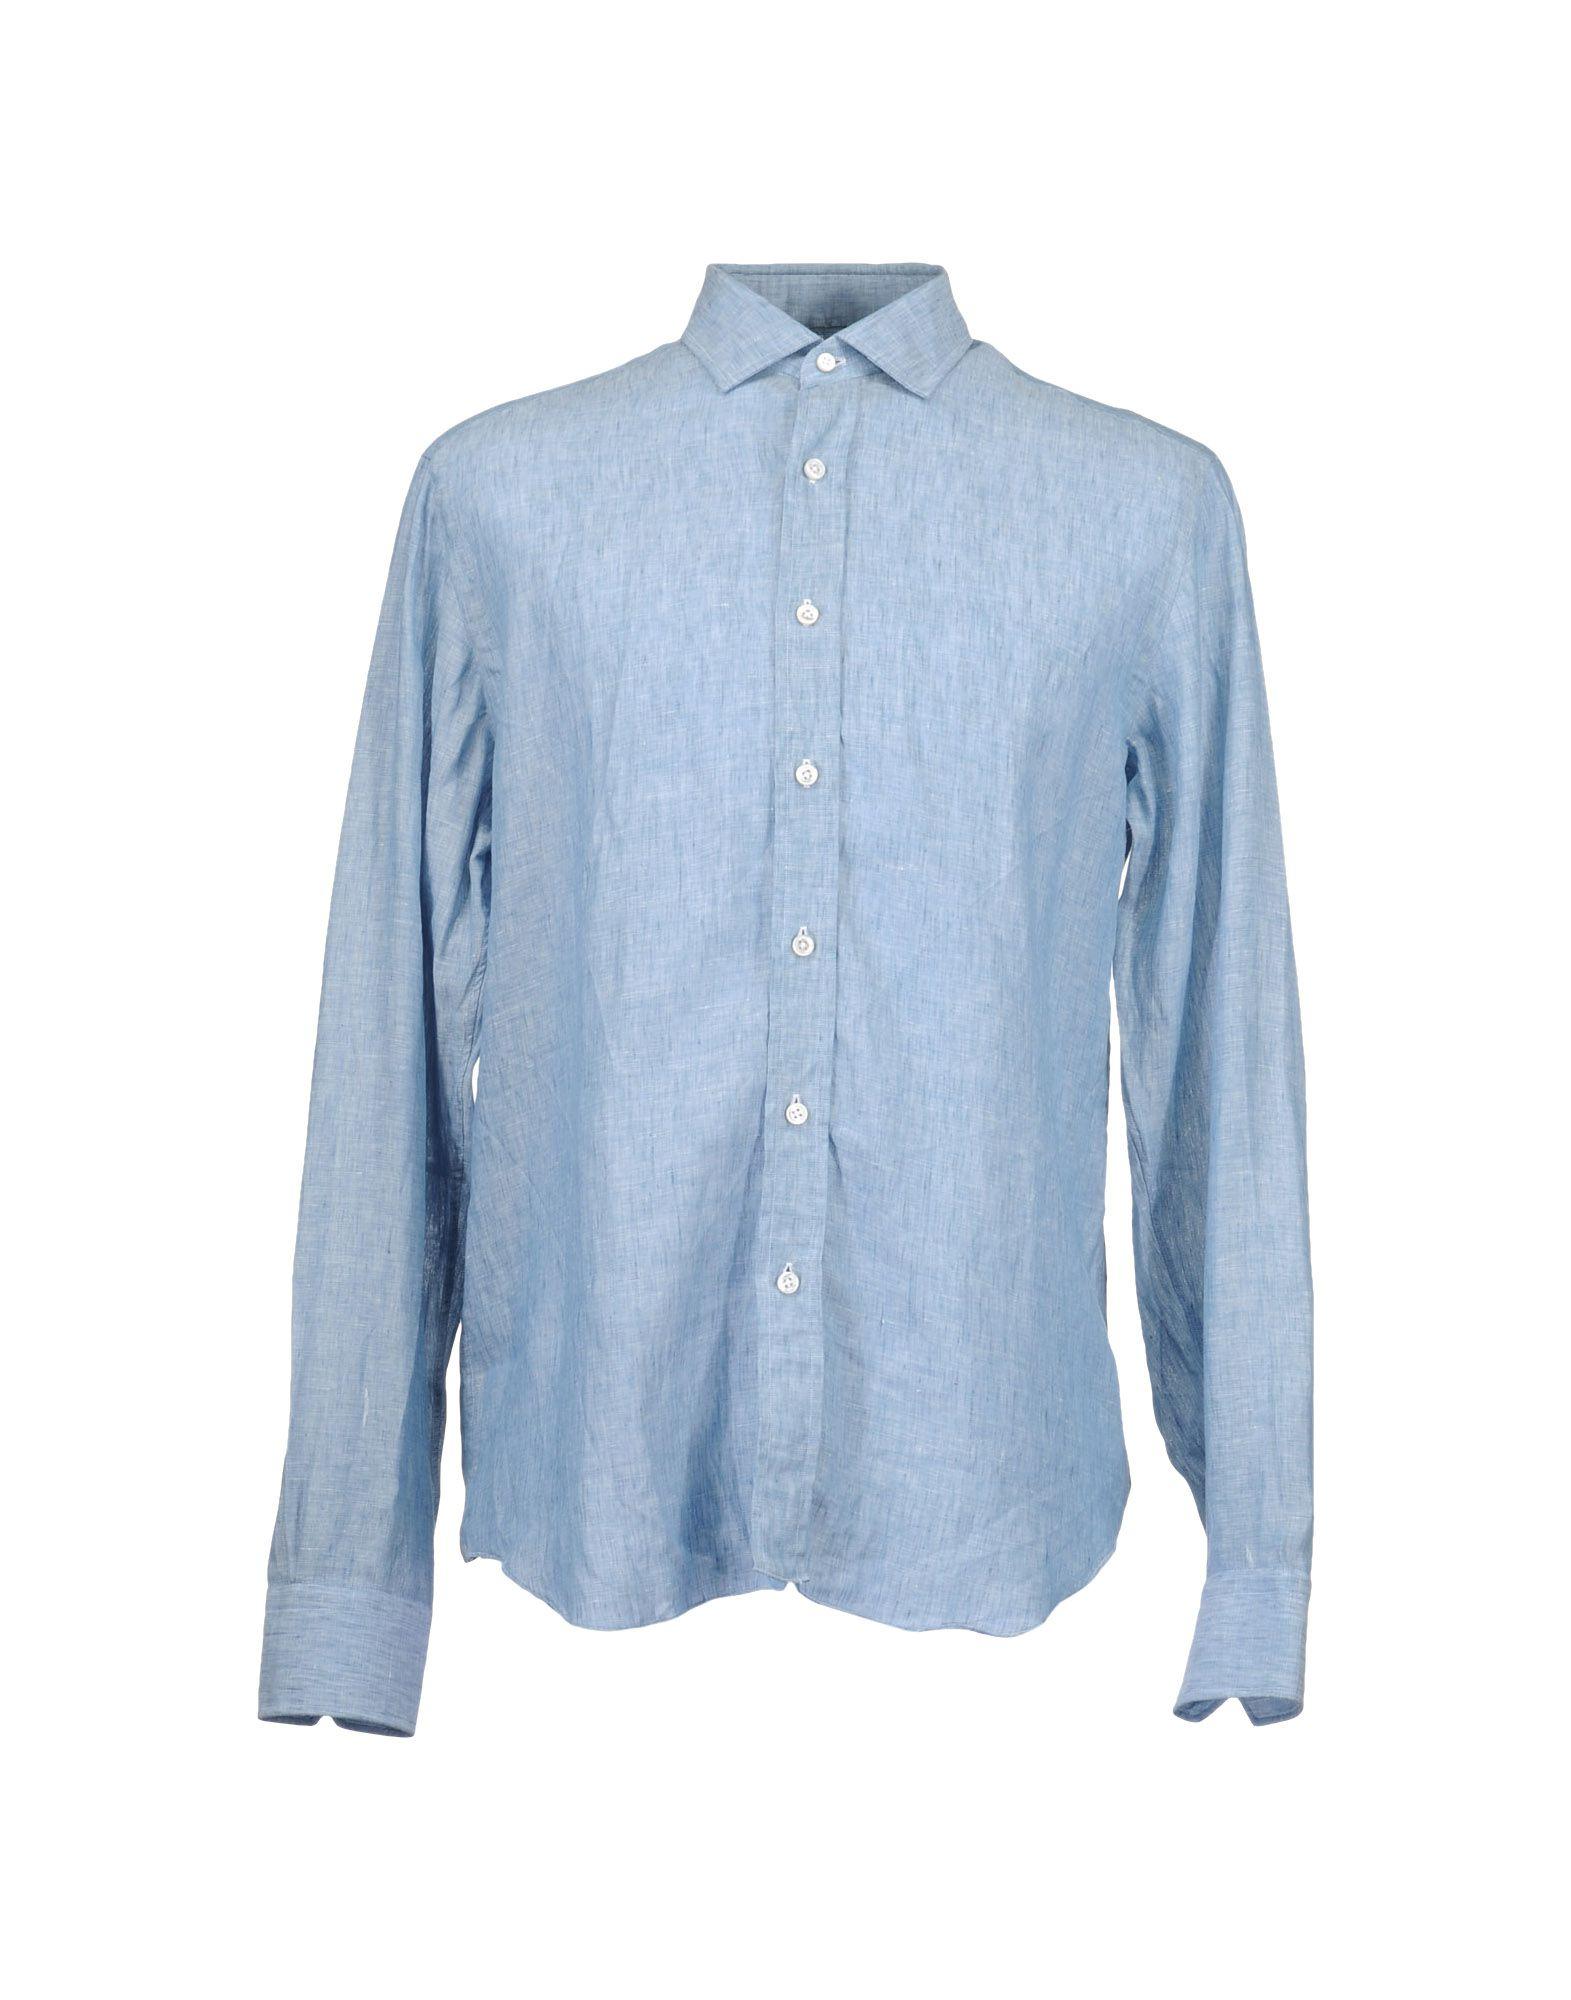 Фото - SALVATORE PICCOLO Рубашка с длинными рукавами рубашка с длинными рукавами 1 мес 3 года